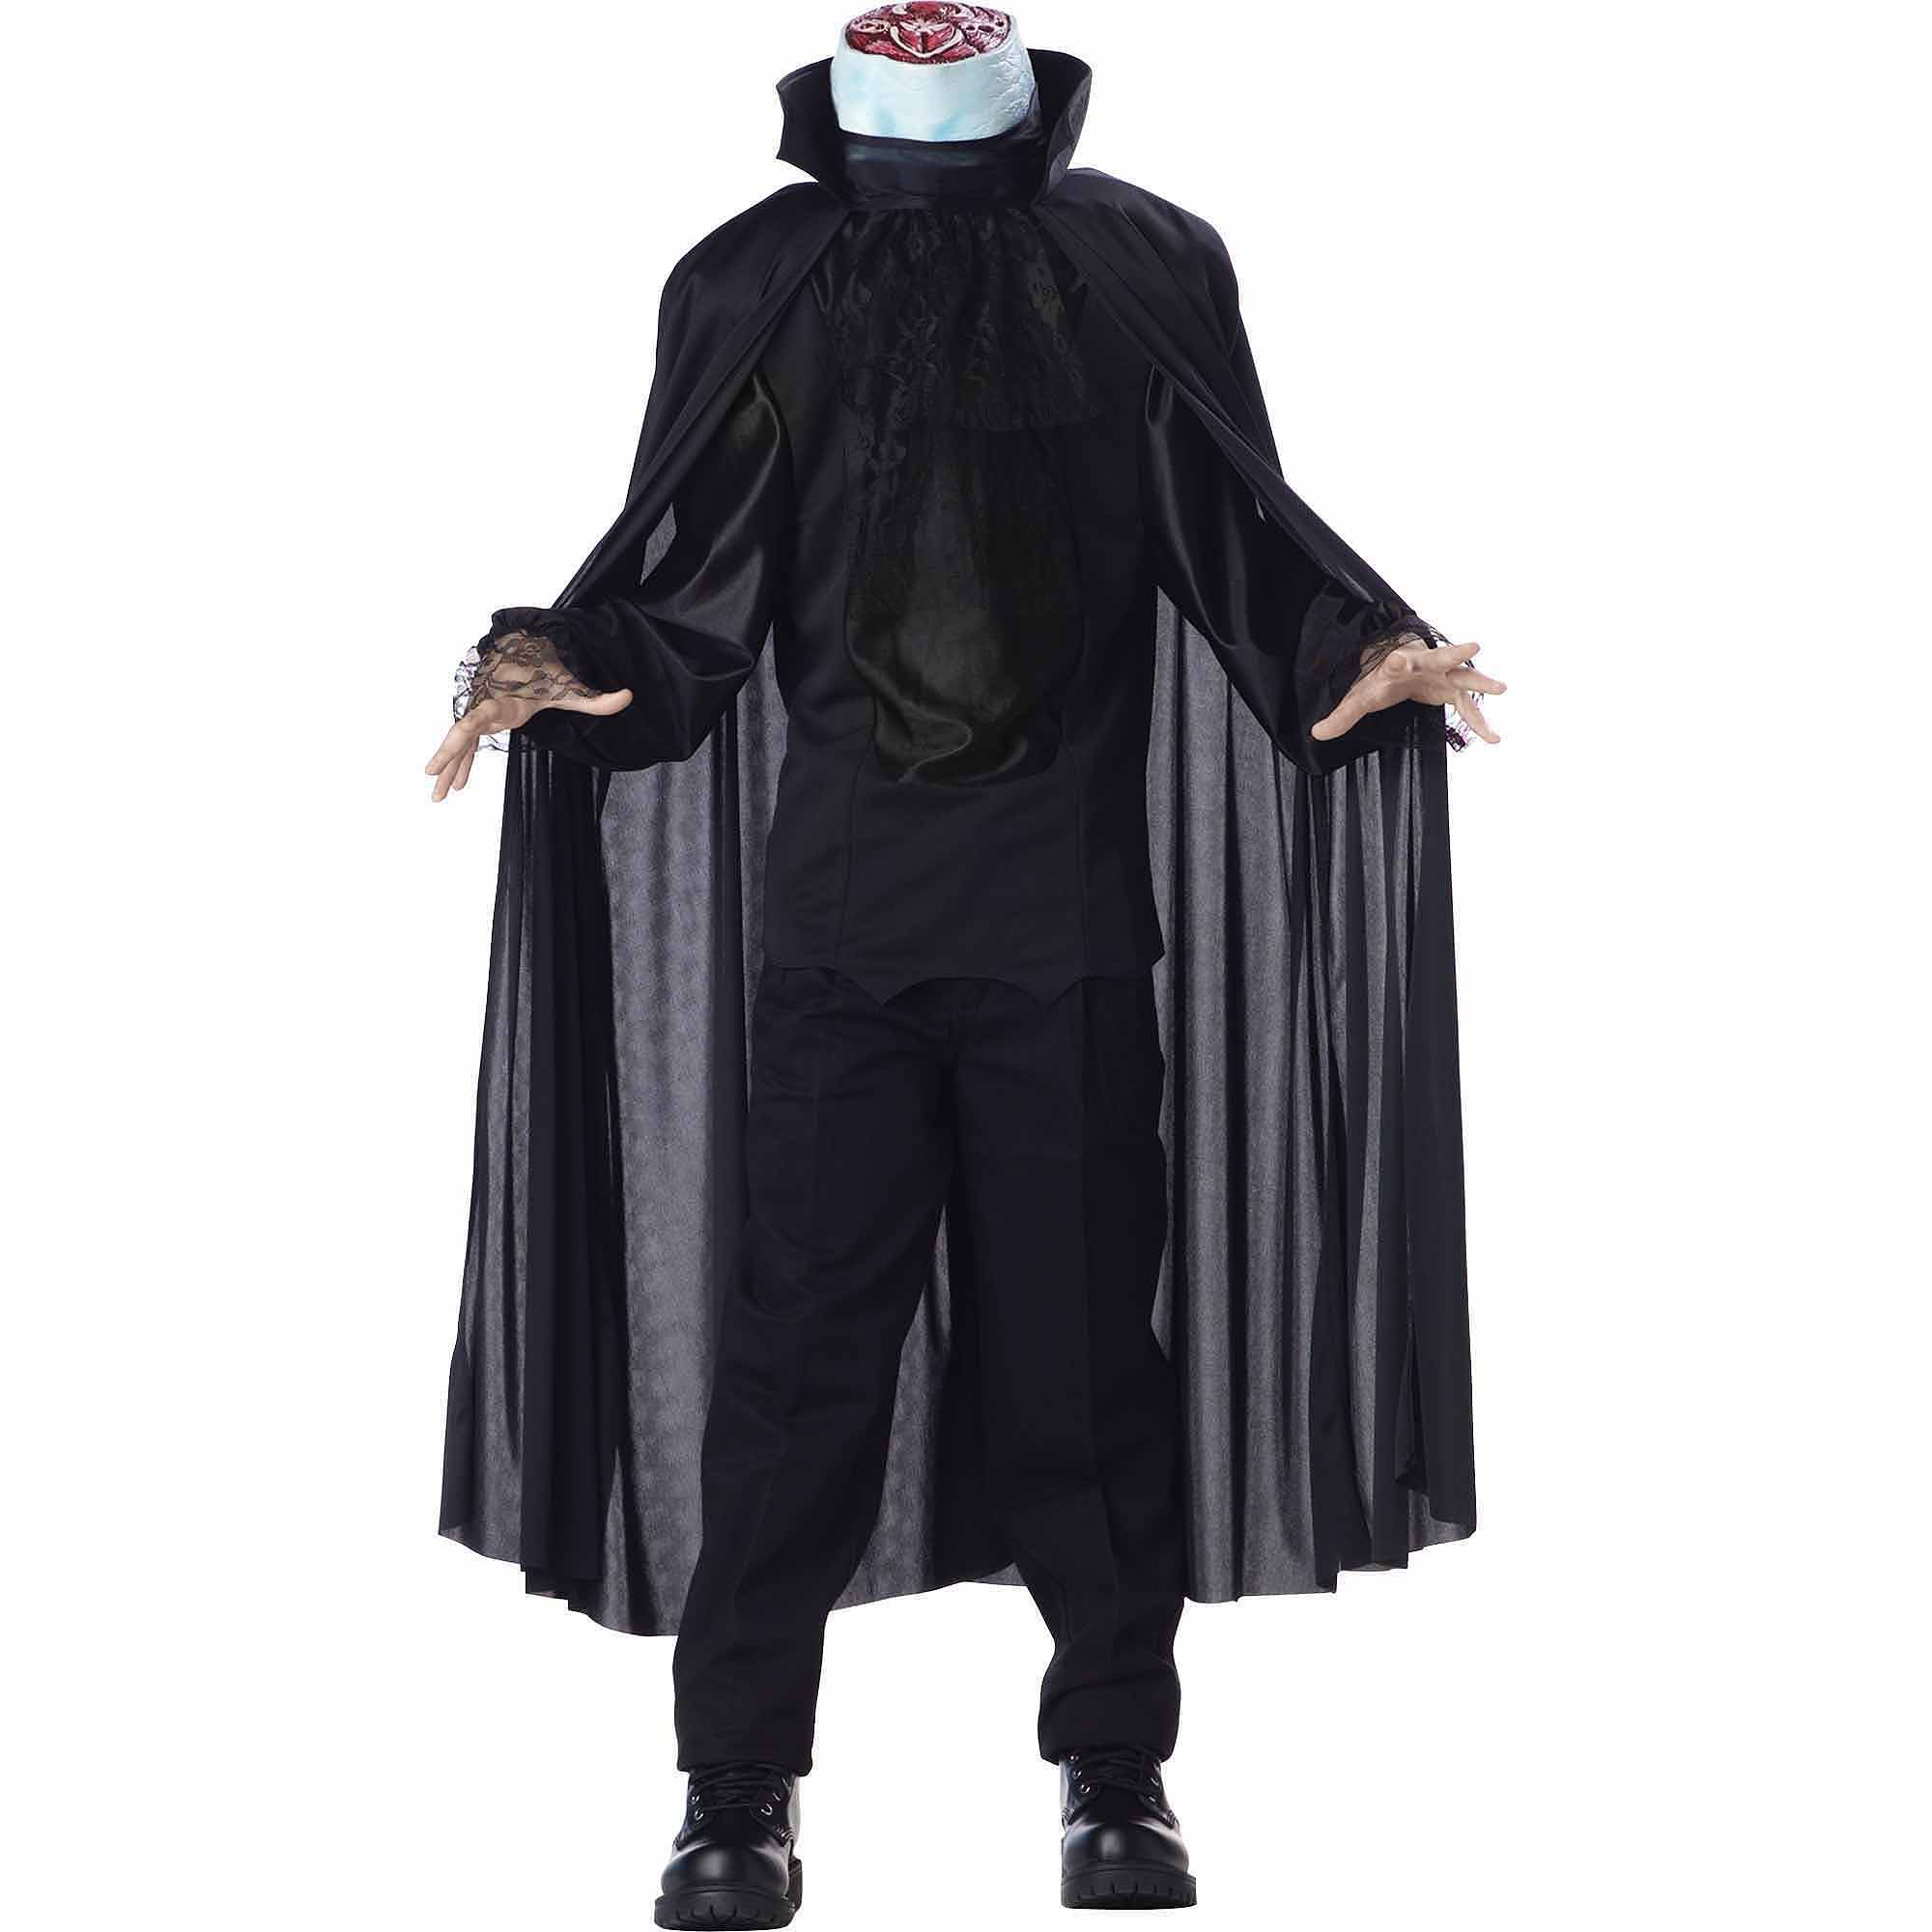 Horseman Headless Child Halloween Costume